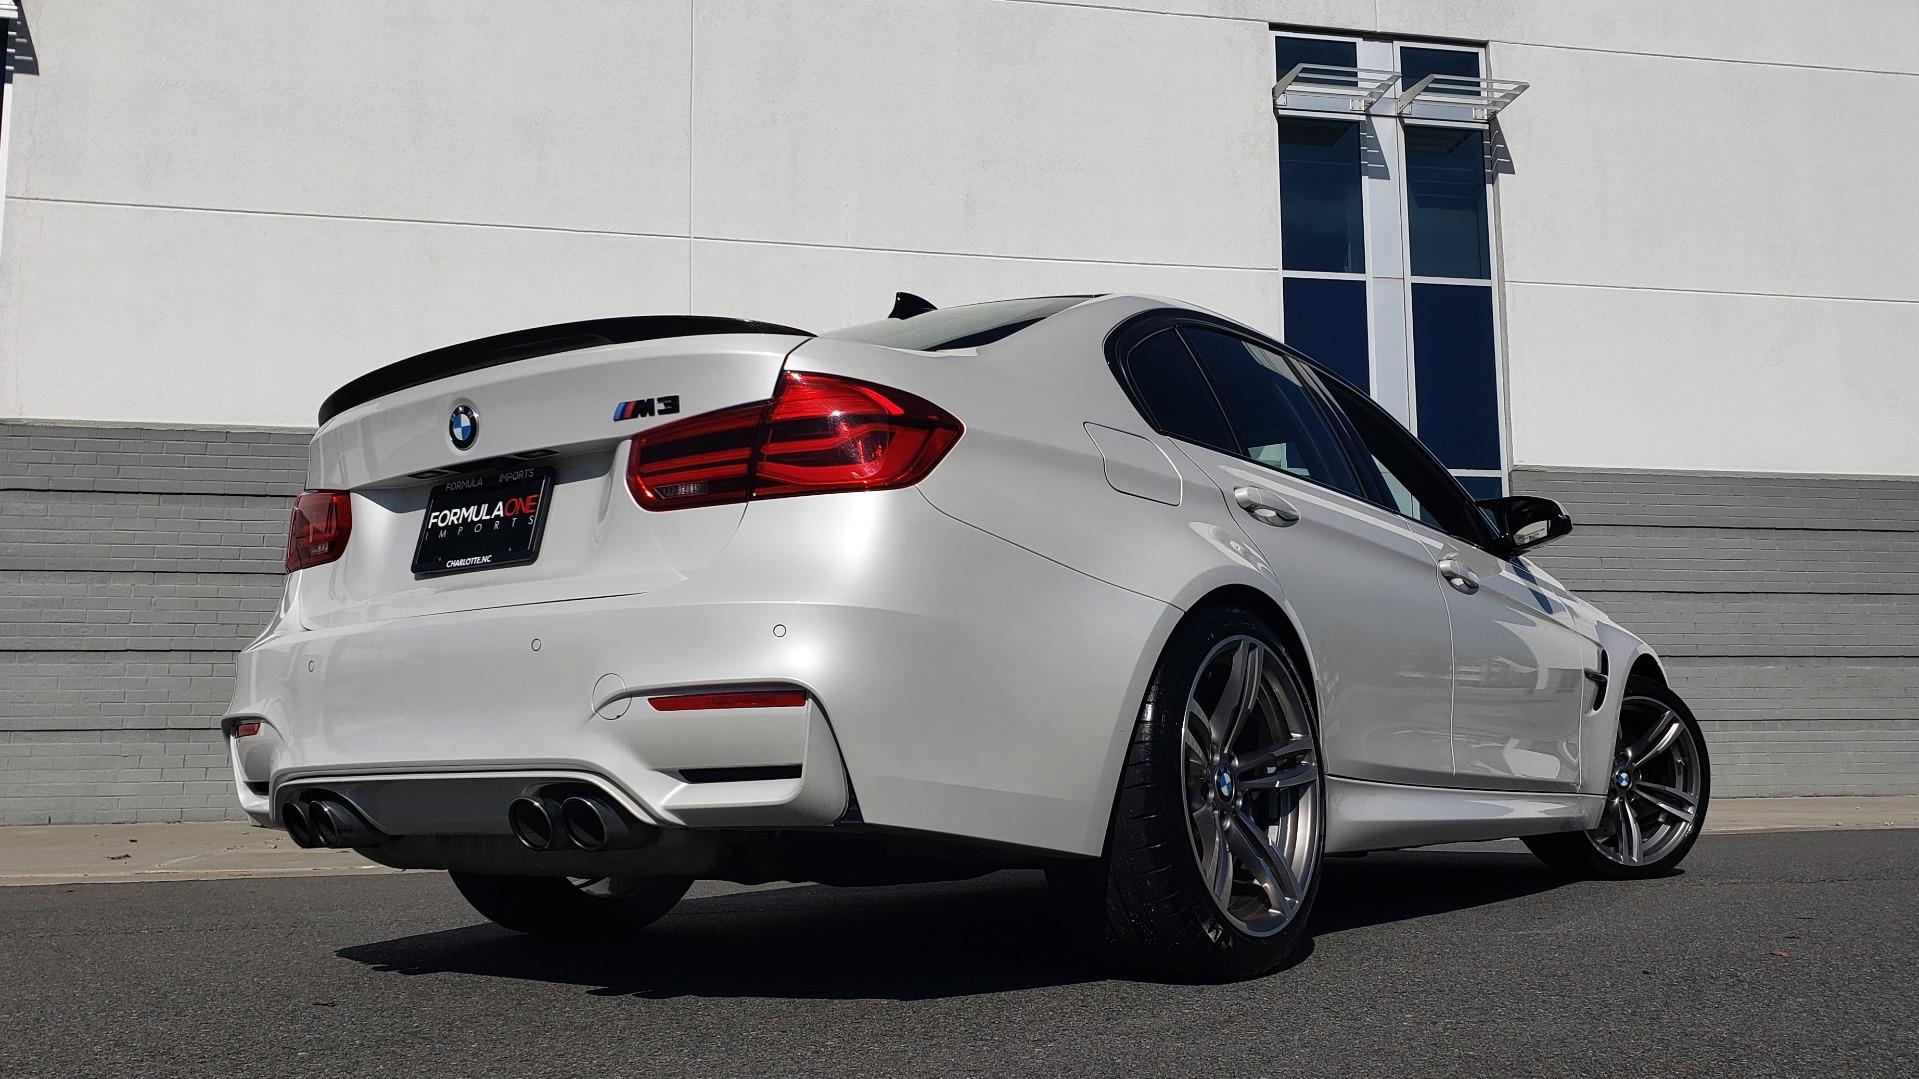 Used 2016 BMW M3 SEDAN / EXECUTIVE PKG / M-SUSPENSION / HARMAN/KARDON SOUND for sale Sold at Formula Imports in Charlotte NC 28227 3